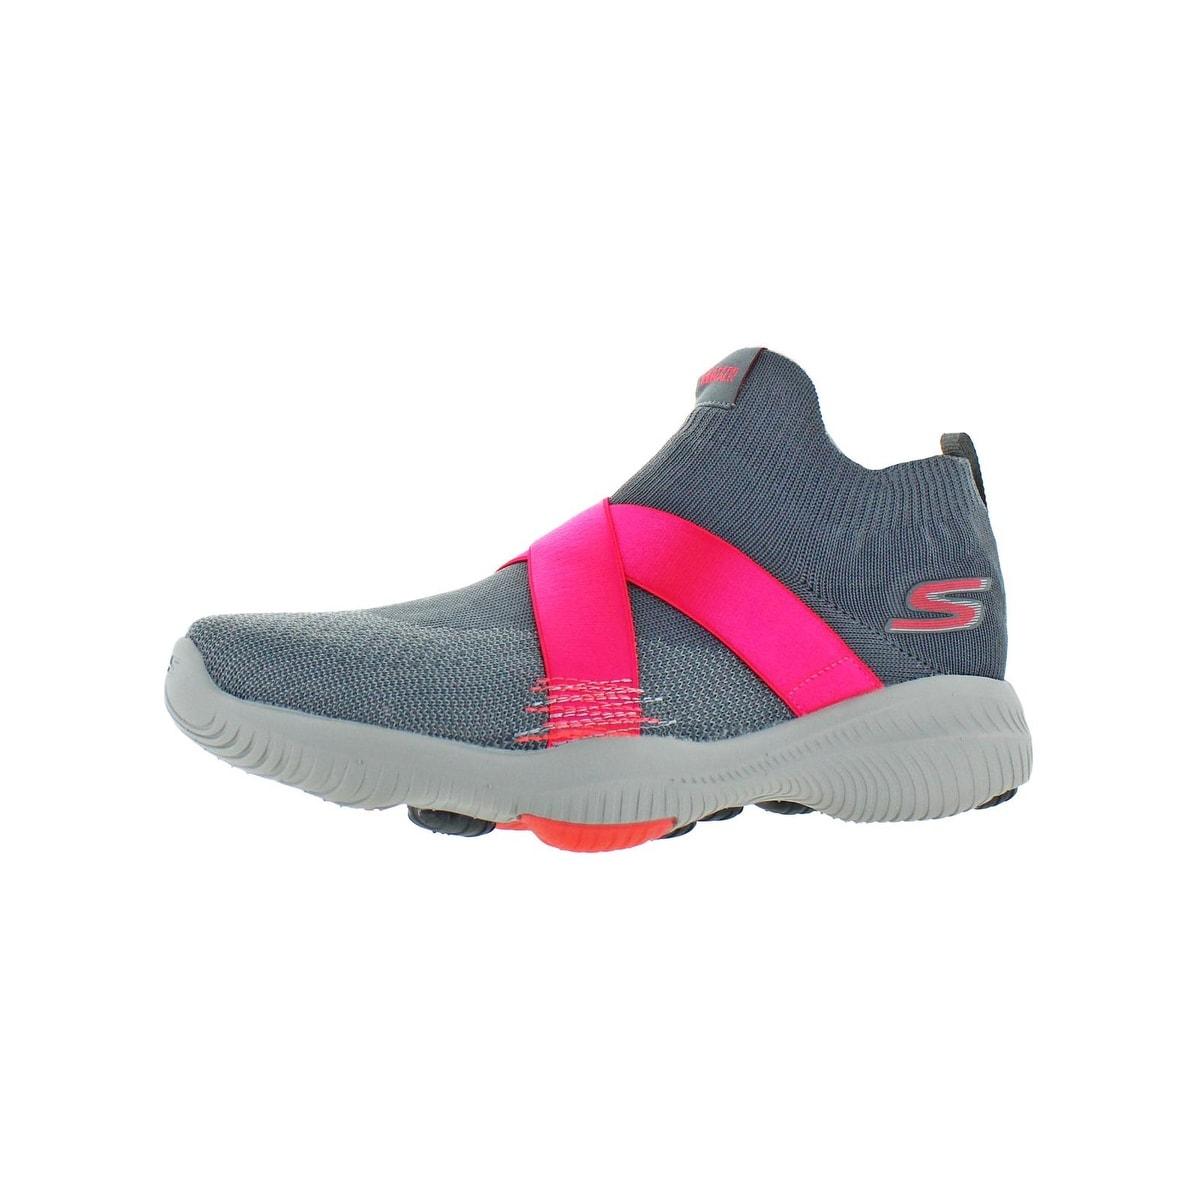 Skechers Womens GOwalk Revolution Ultra Bolt Walking Shoes Athletic Lifestyle